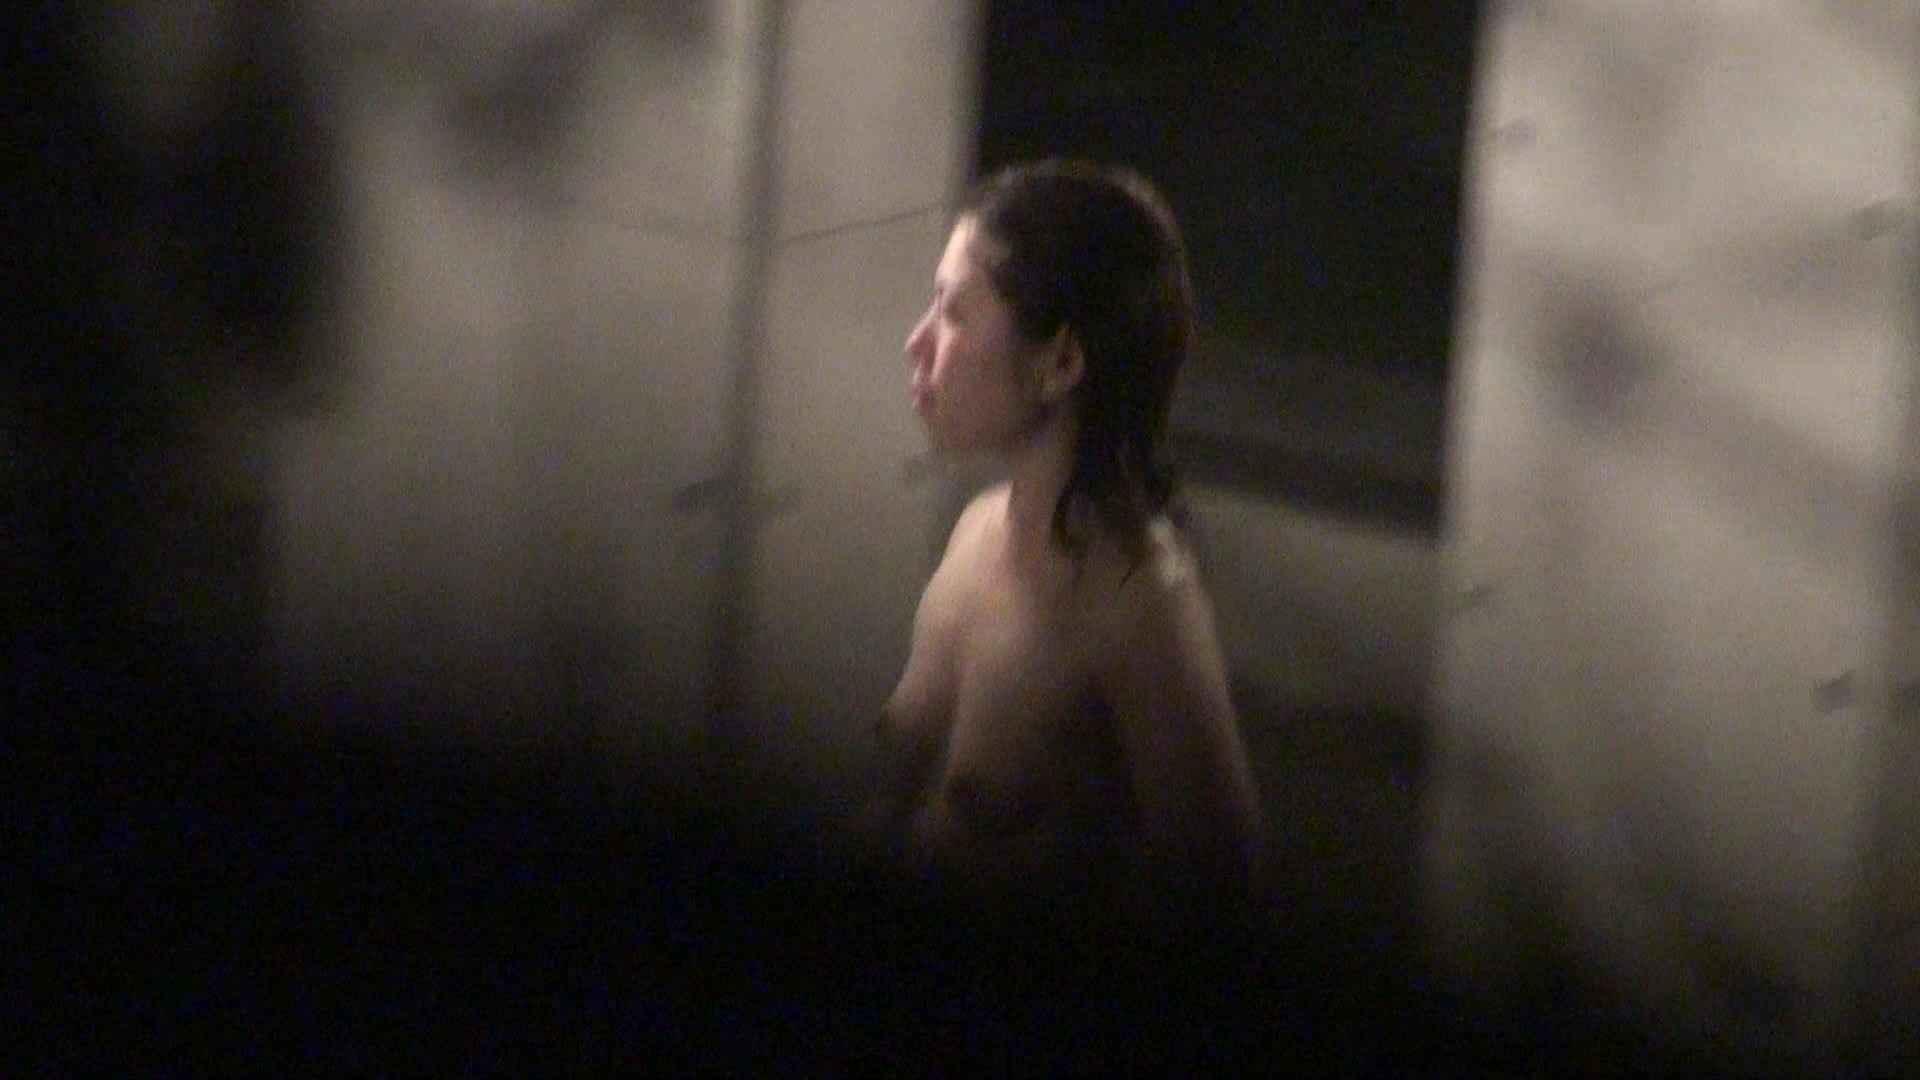 Aquaな露天風呂Vol.327 盗撮師作品  72pic 27